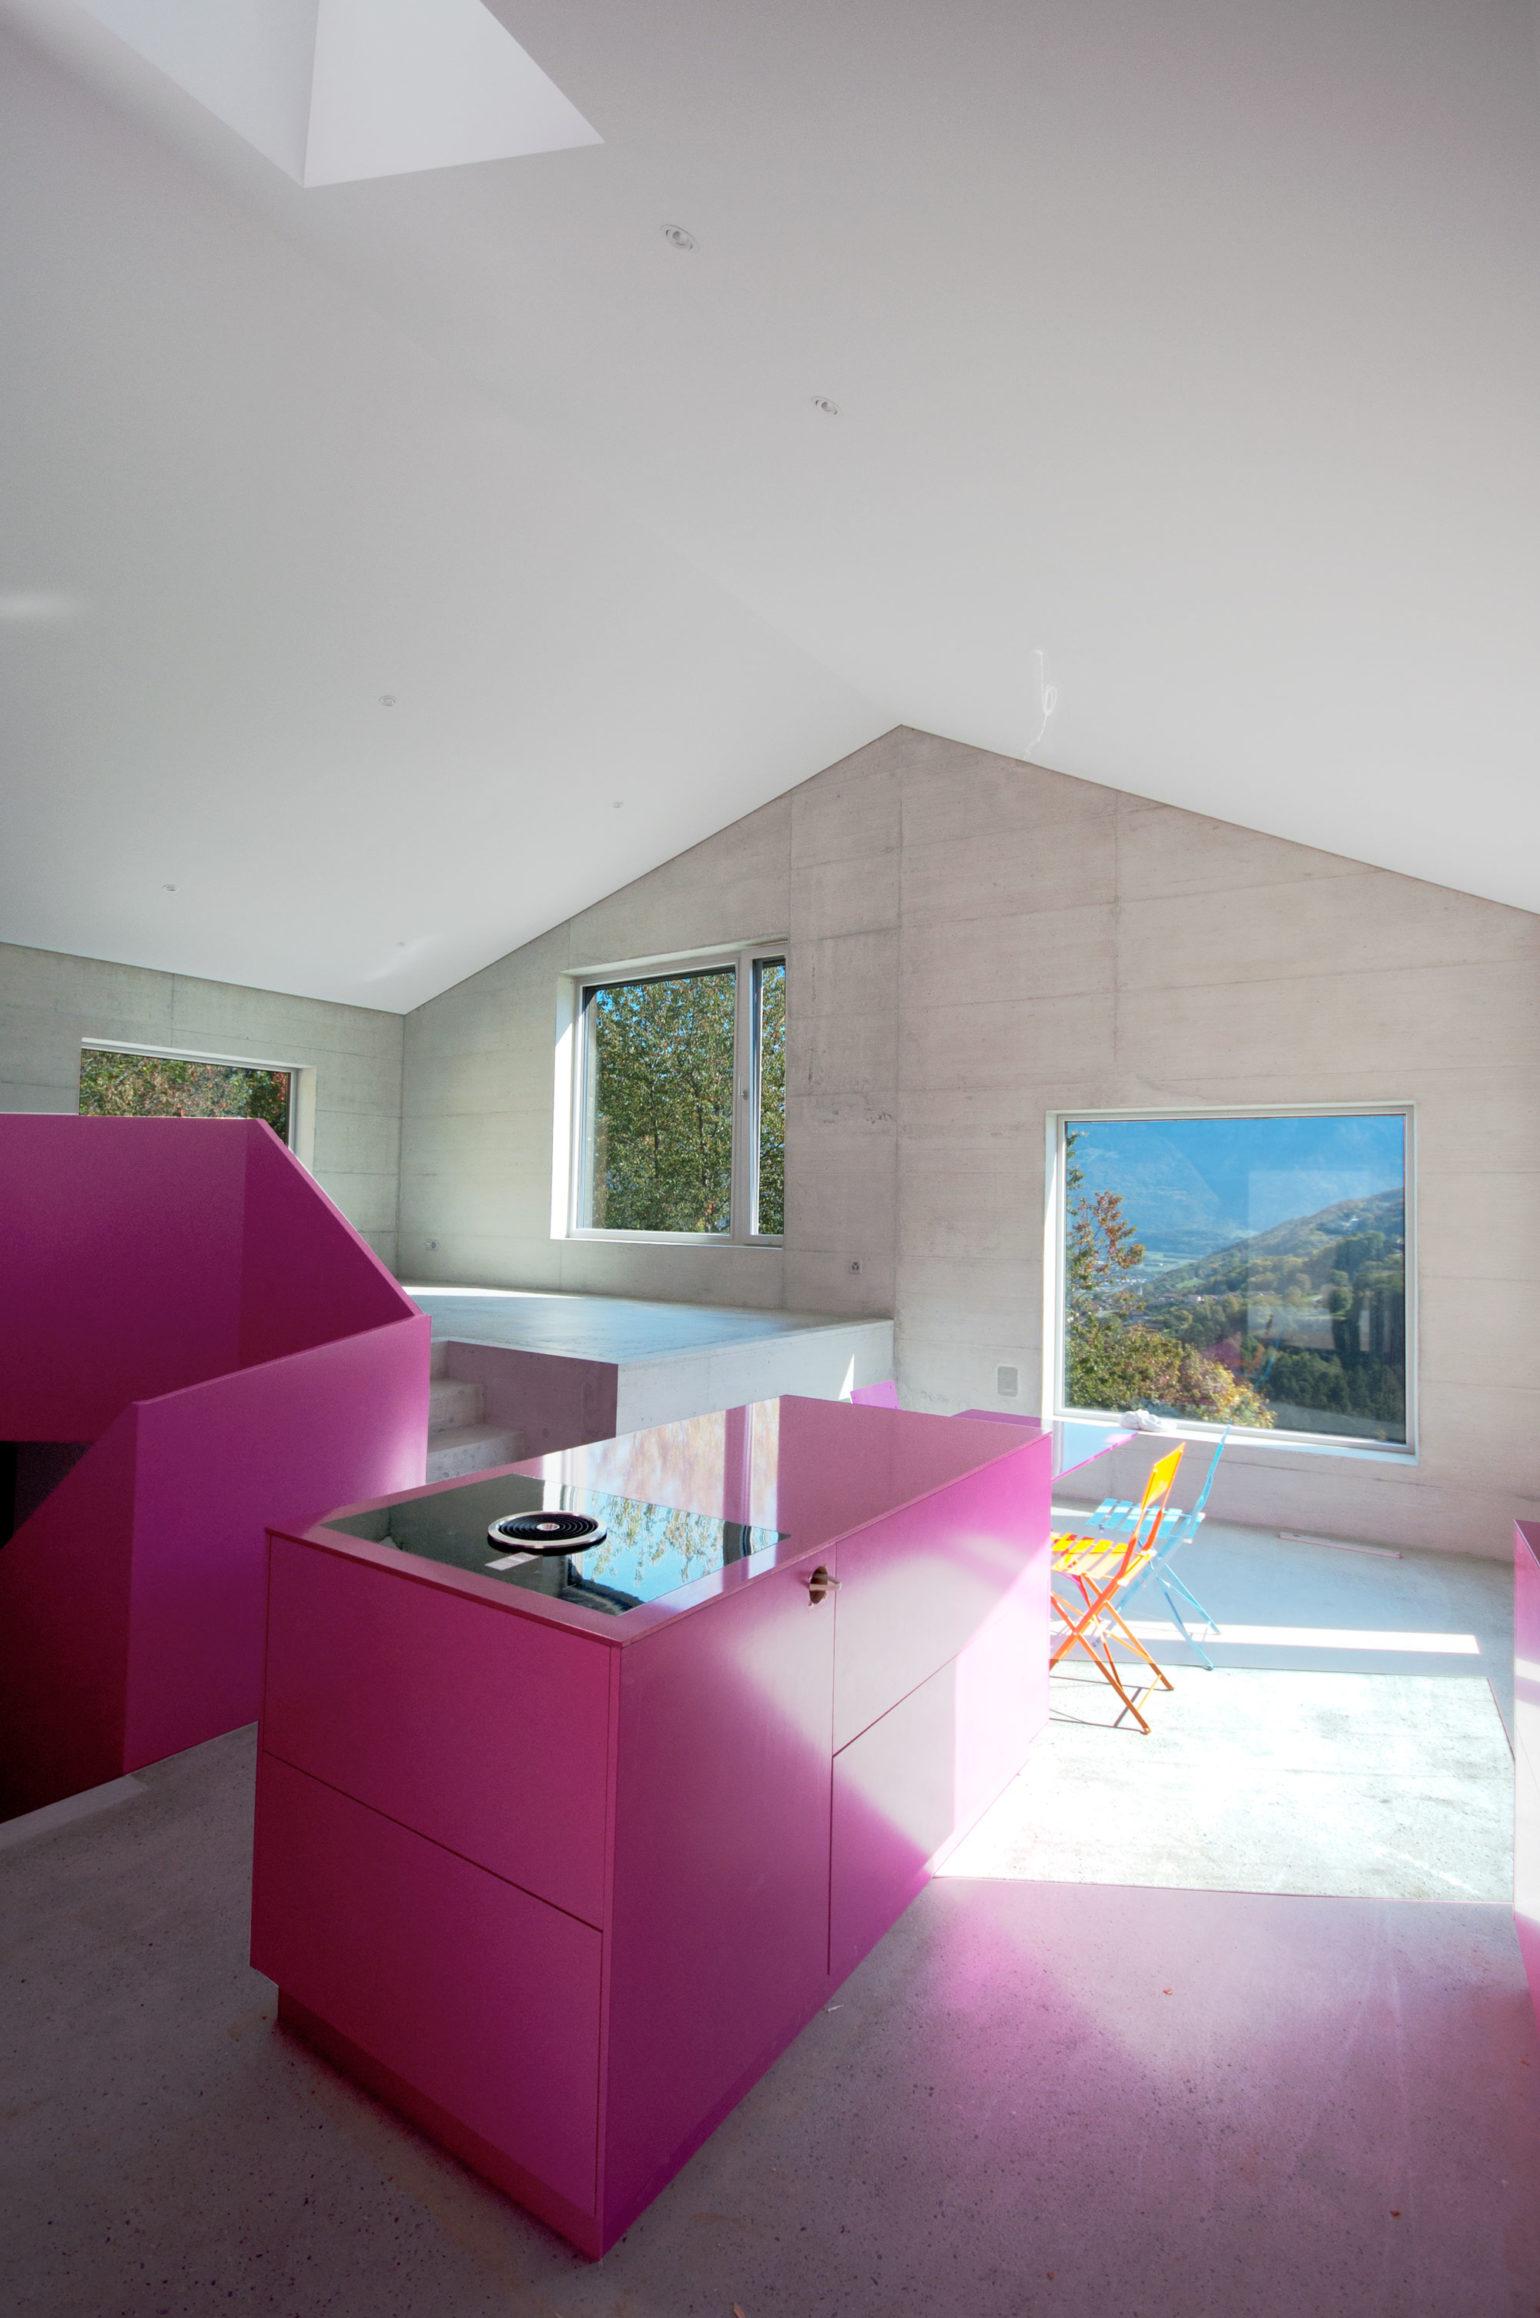 maison_dubosson_troistorrents_meyer_architecture_sion_05